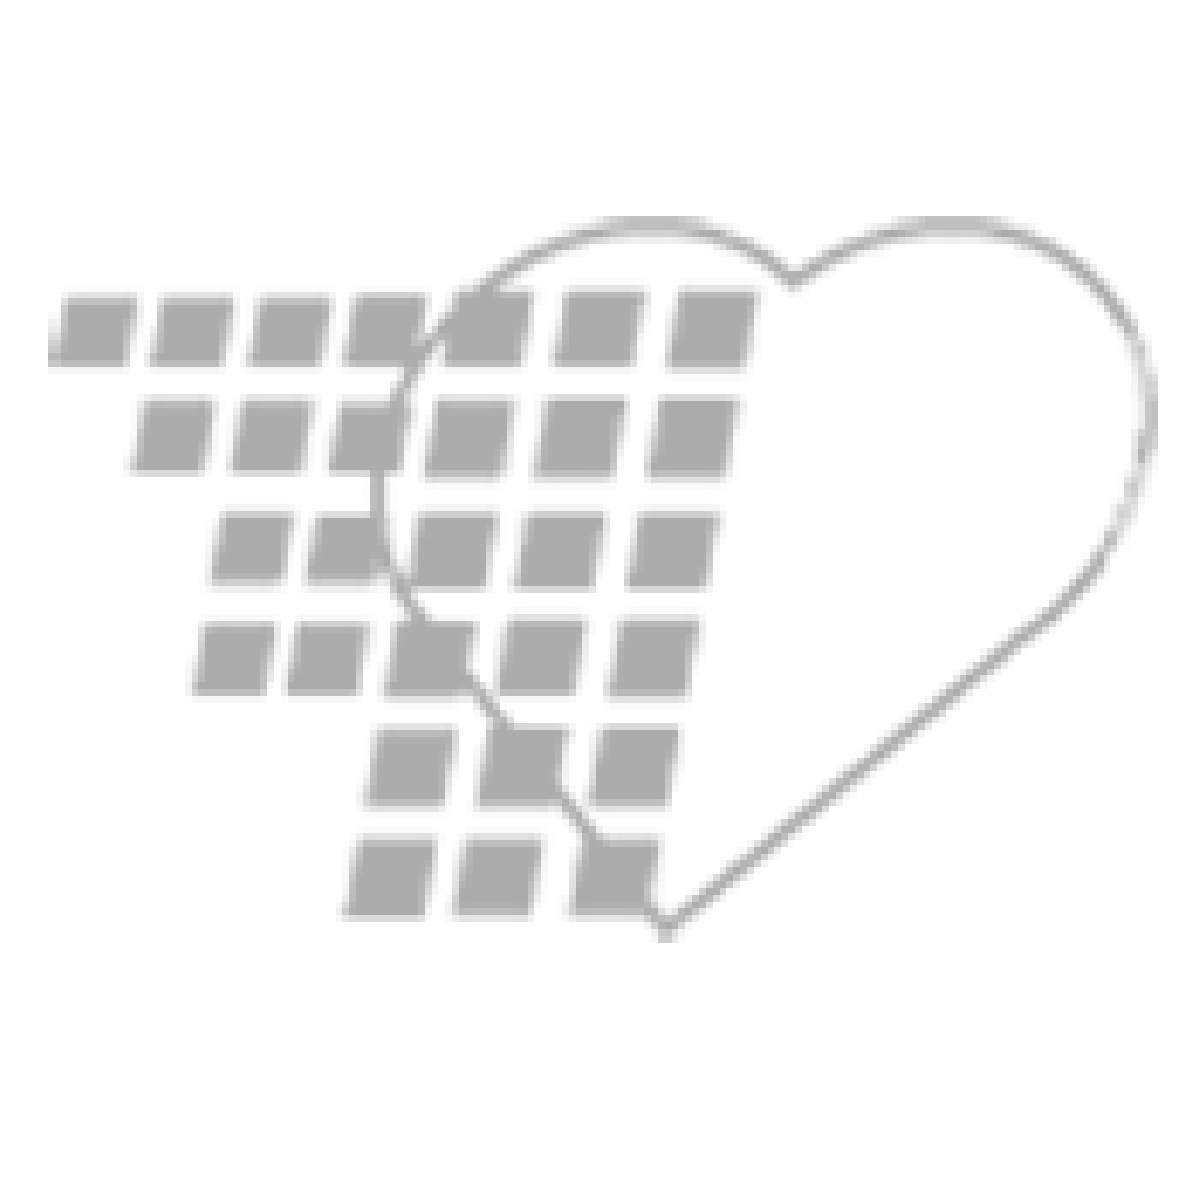 08-84-9000 Steri-Drape Surgical Pack